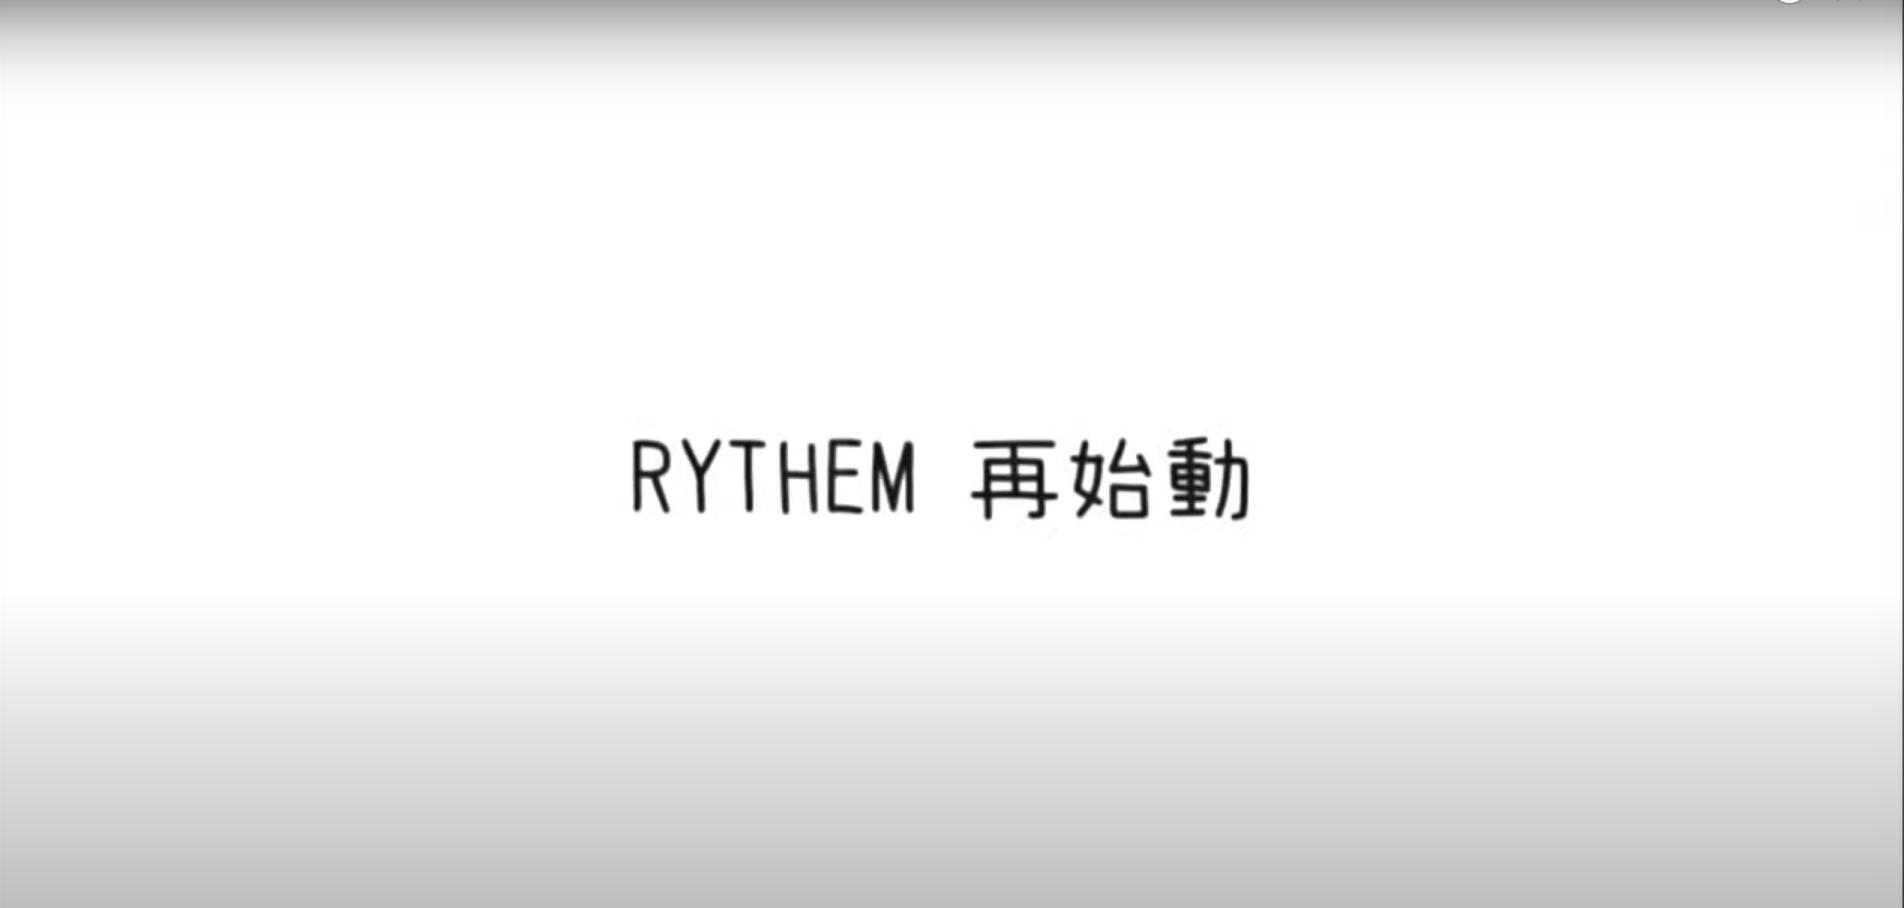 RYTHEM再始動決定